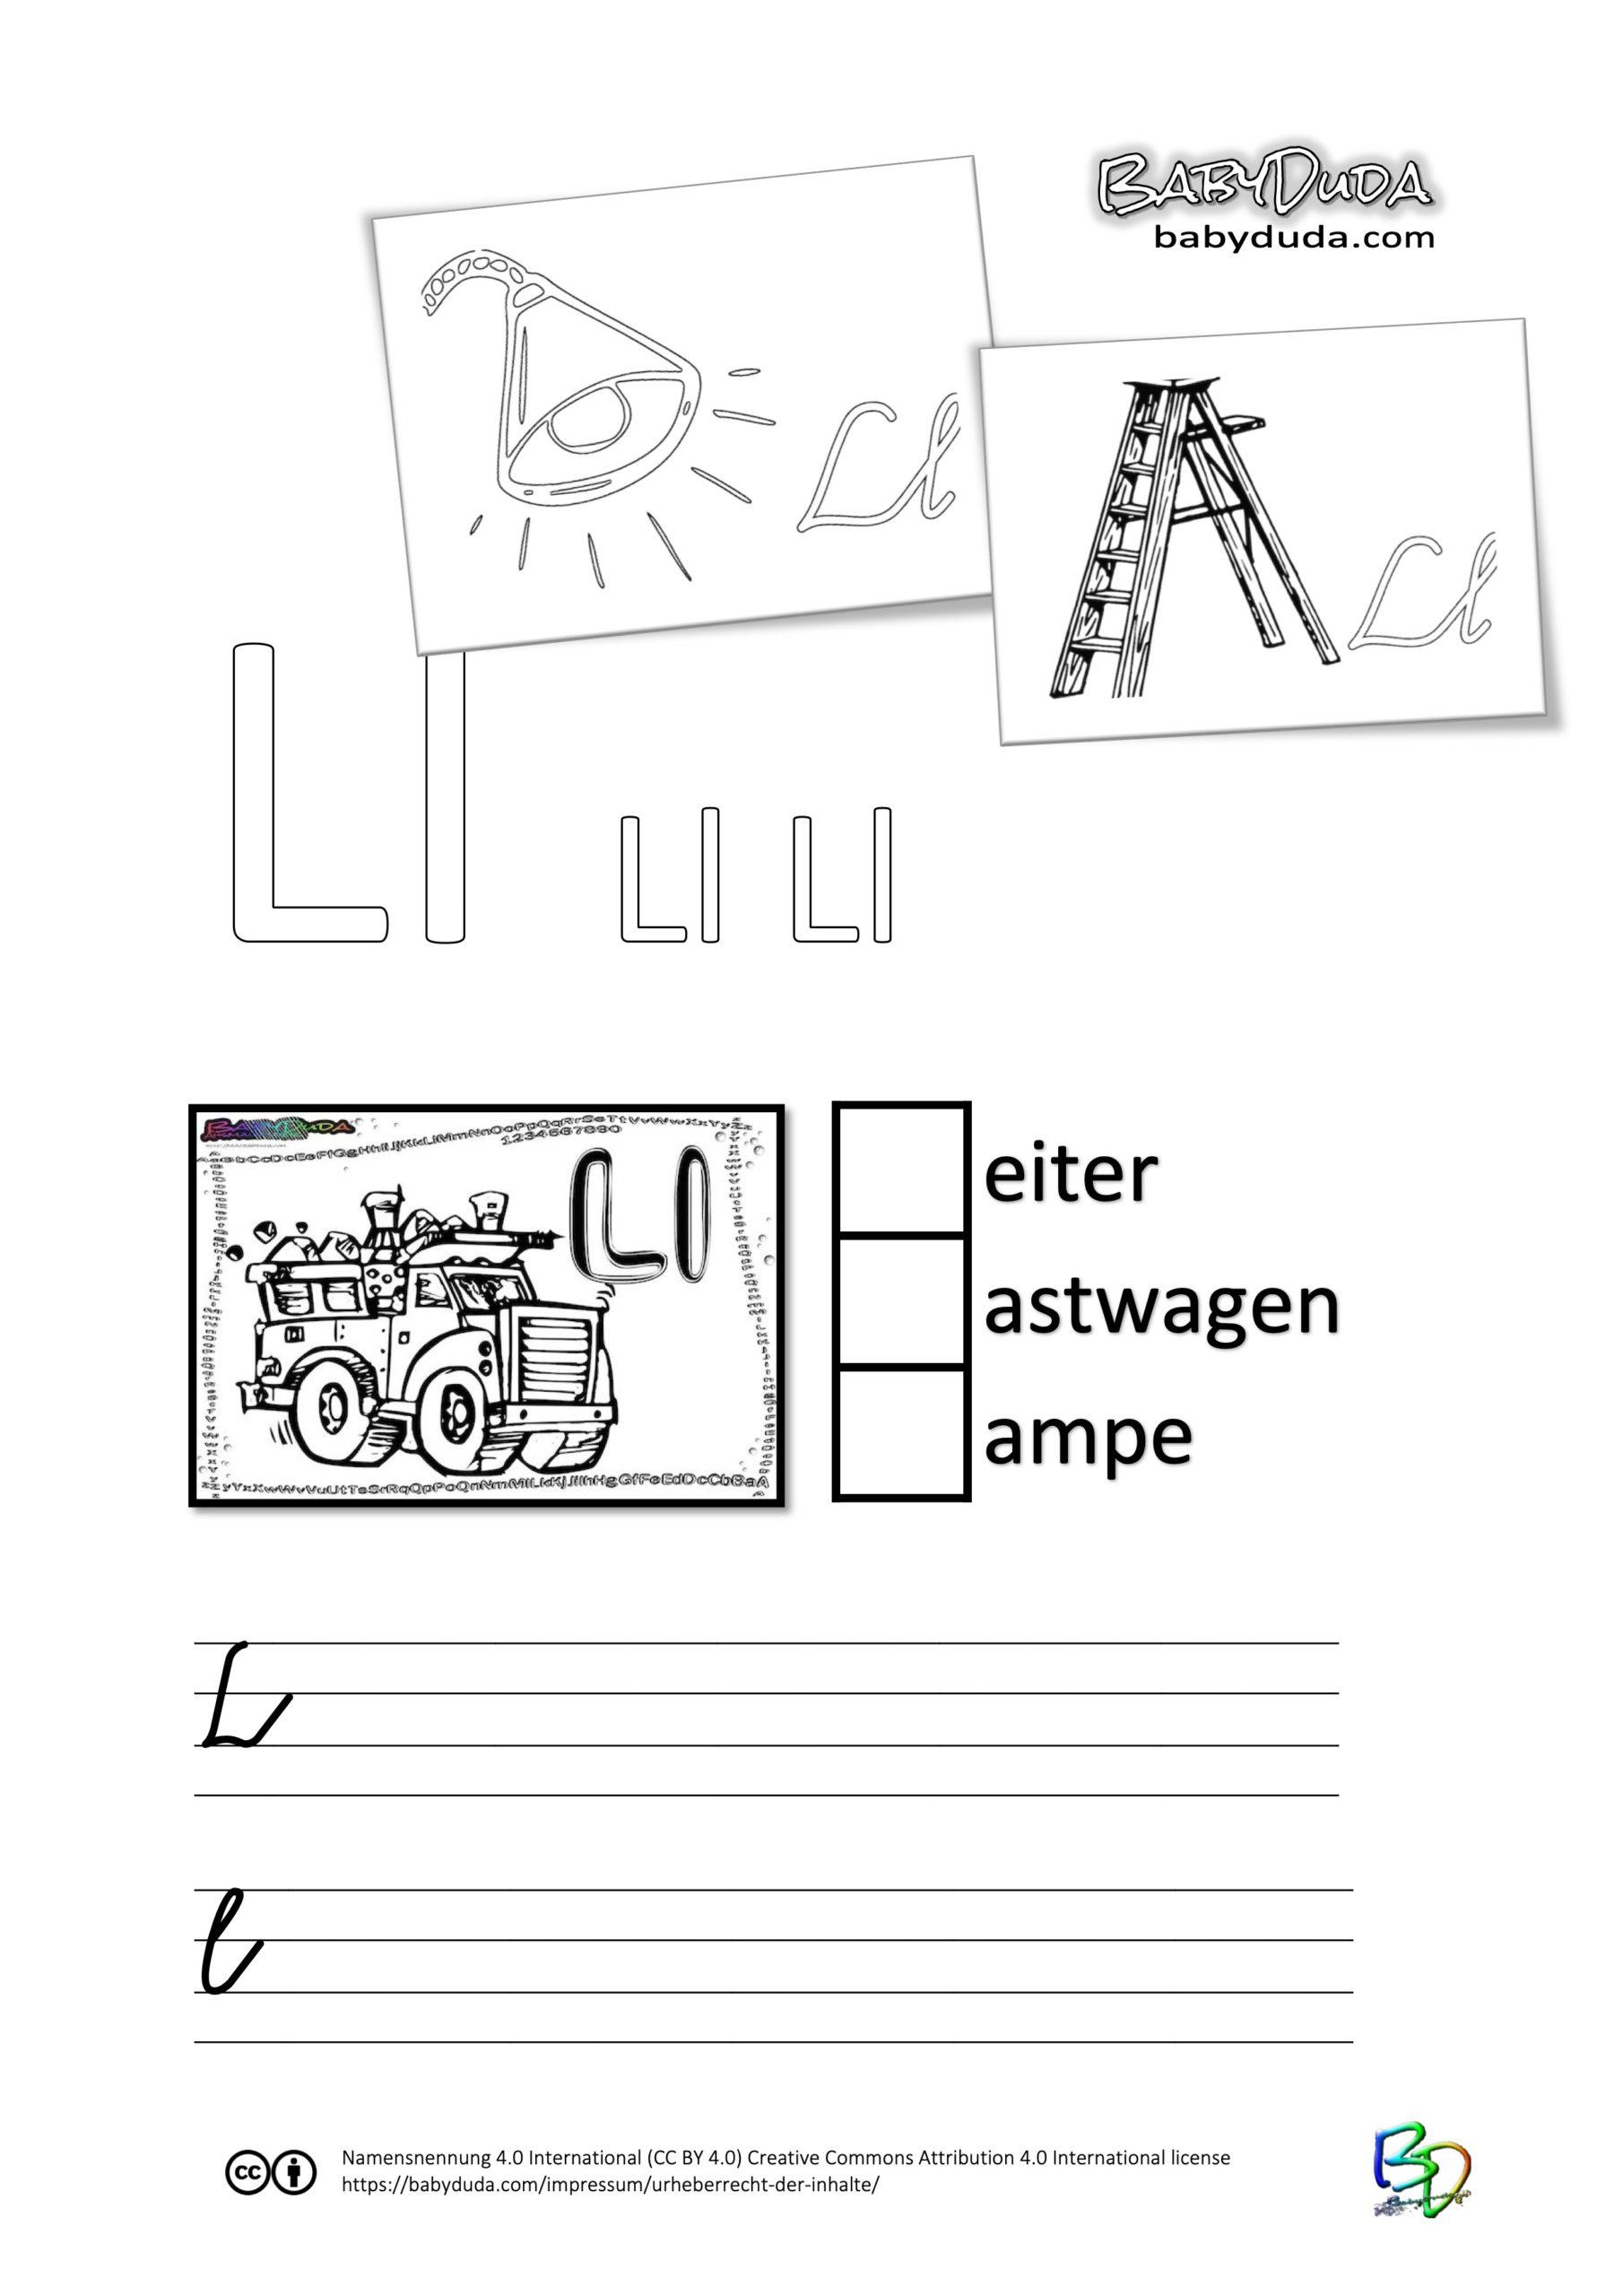 ABC-Ausmalbuch-Arbeitsblatt-L